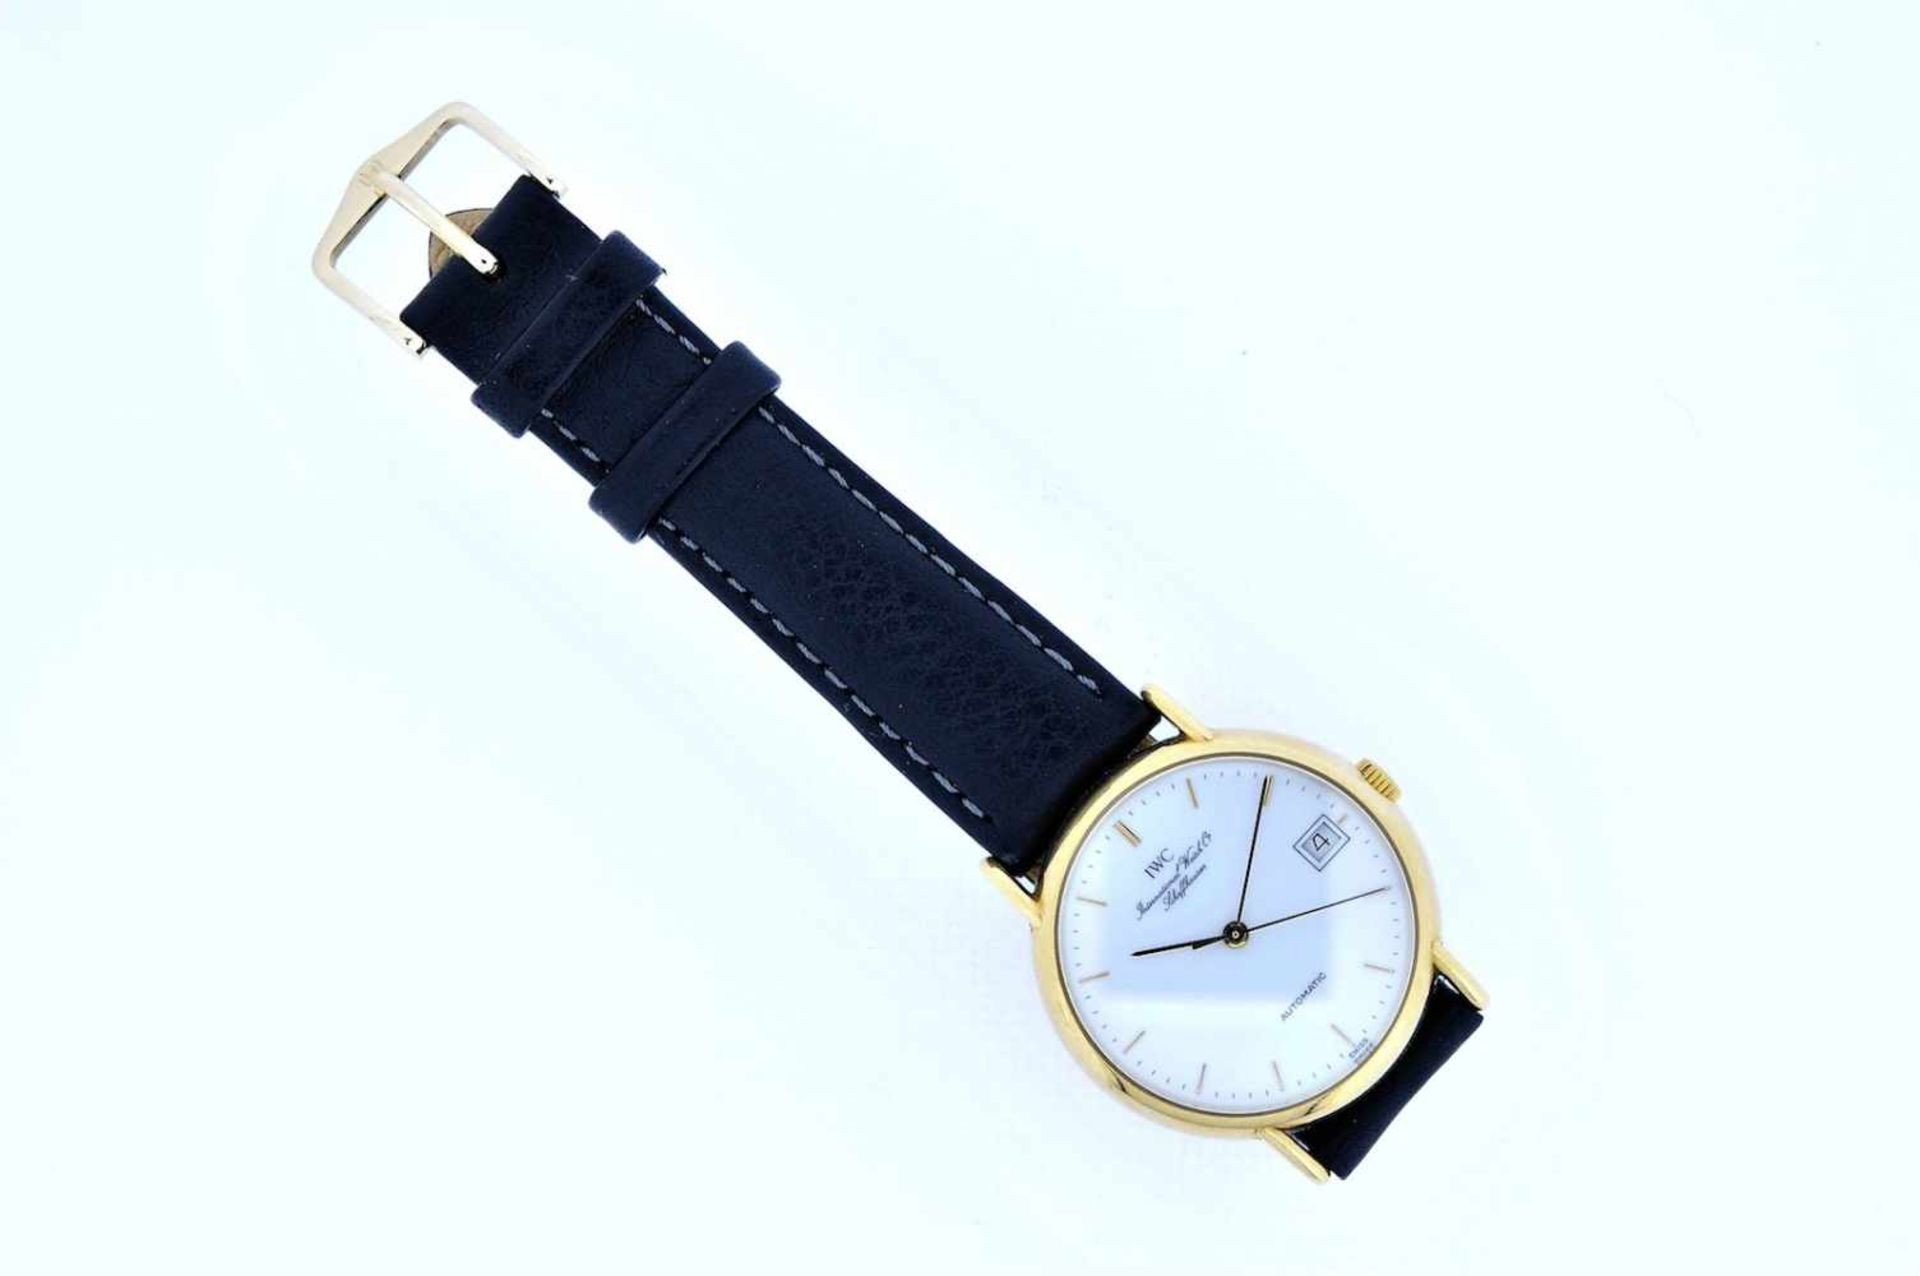 Los 20 - IWC Goldene 18karätige Armbanduhr an Lederband, IWC, Automatik, zentrale Sekunde, Ankerwerk,